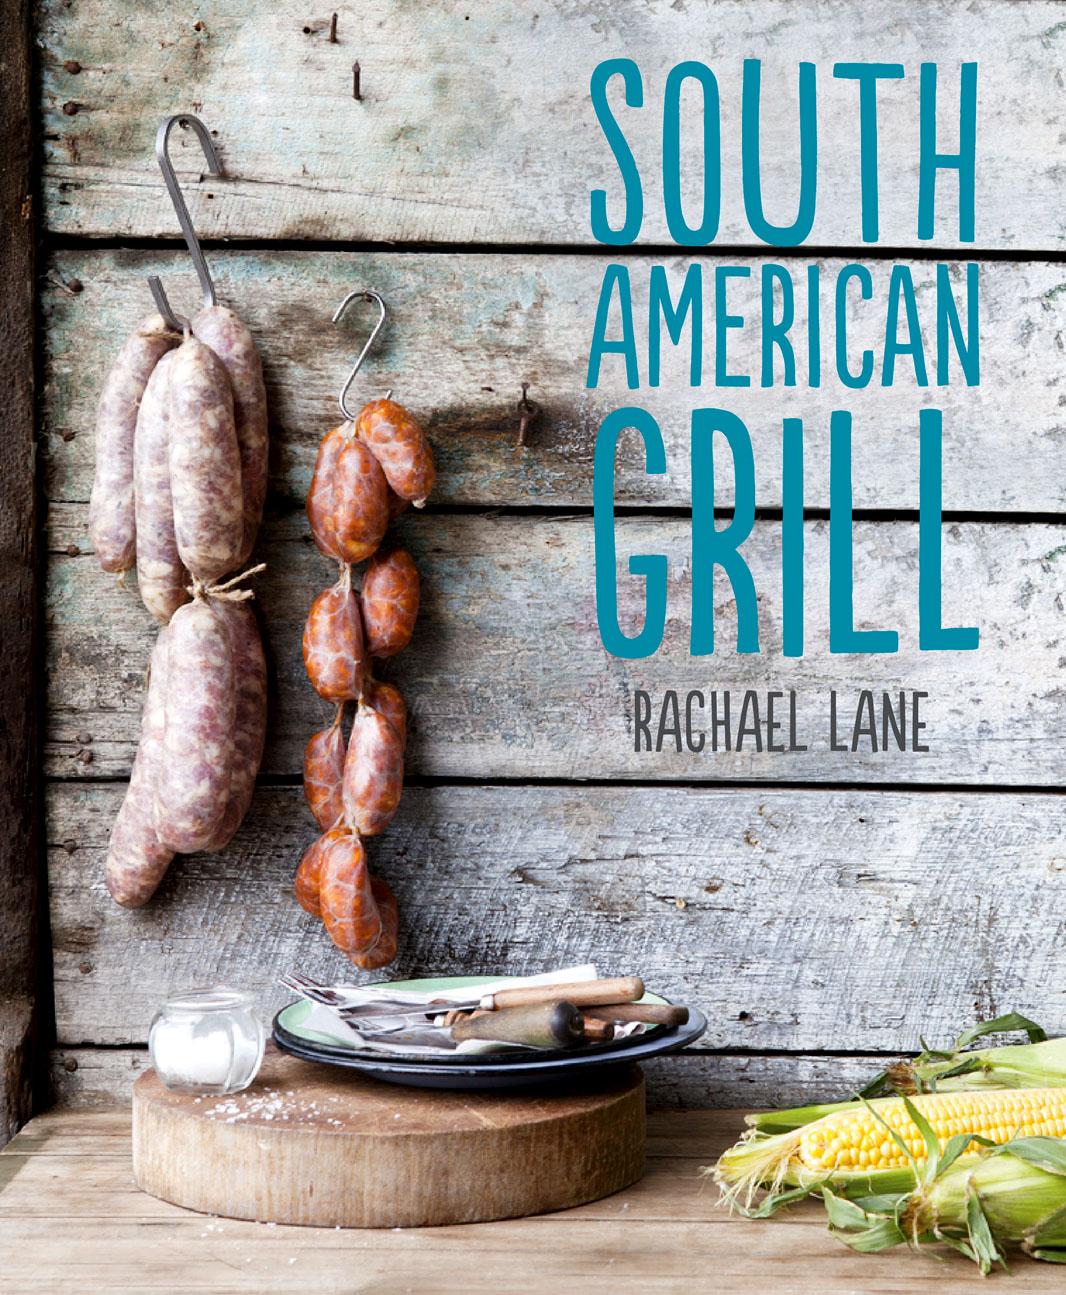 SOuthAmerican_Grill.jpg